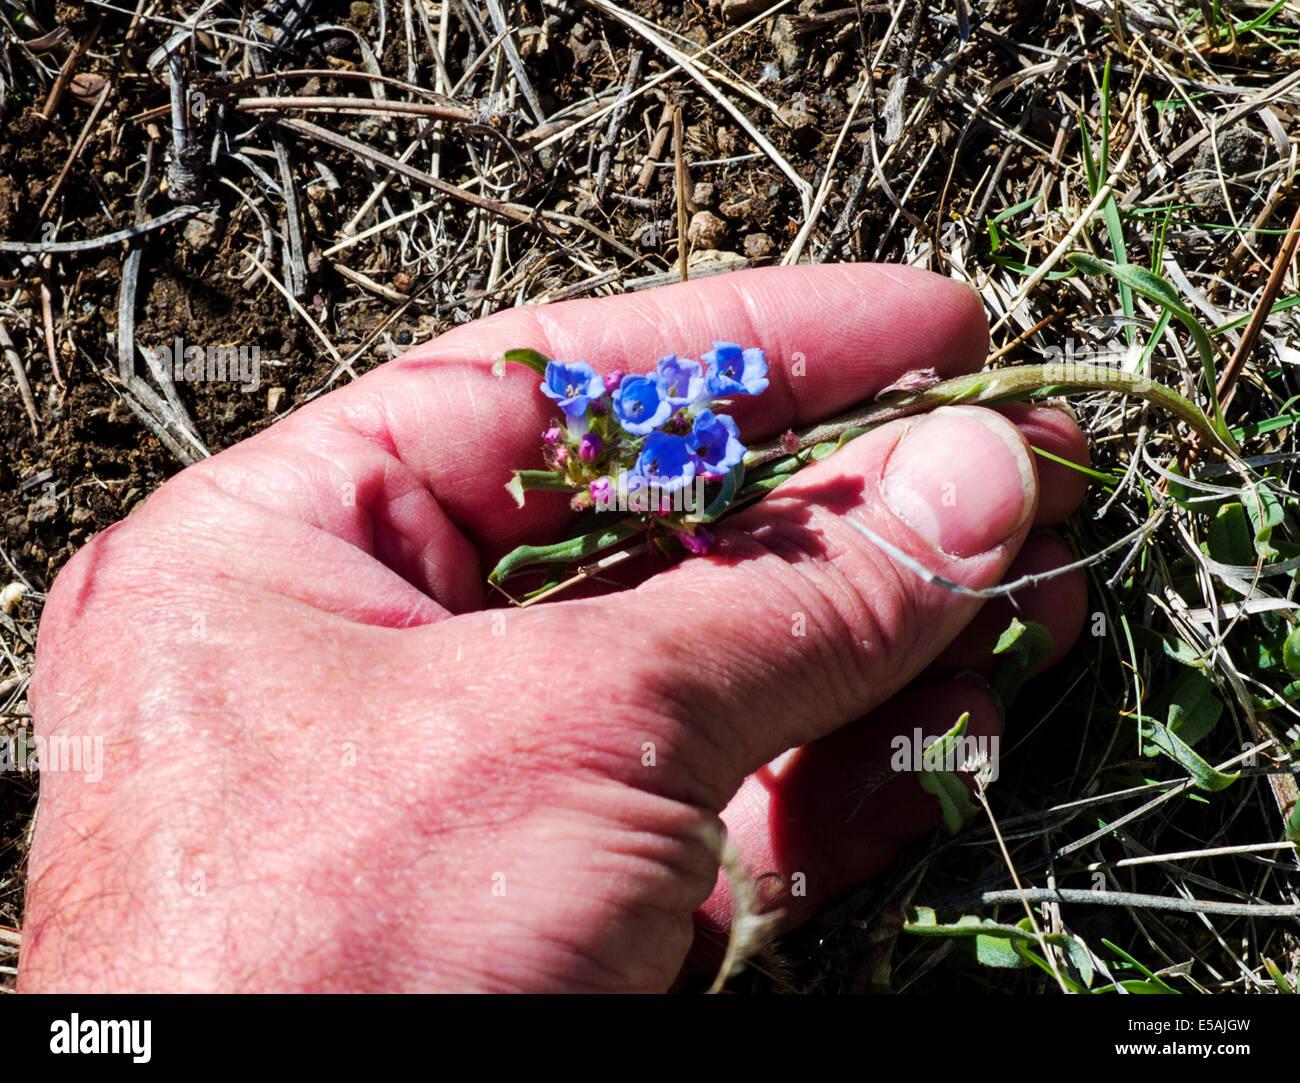 Main tenant Mertensia lanceolata, Foothills Mertensia, Boraginacées, Bourrache fleurs sauvages en fleurs, le Photo Stock